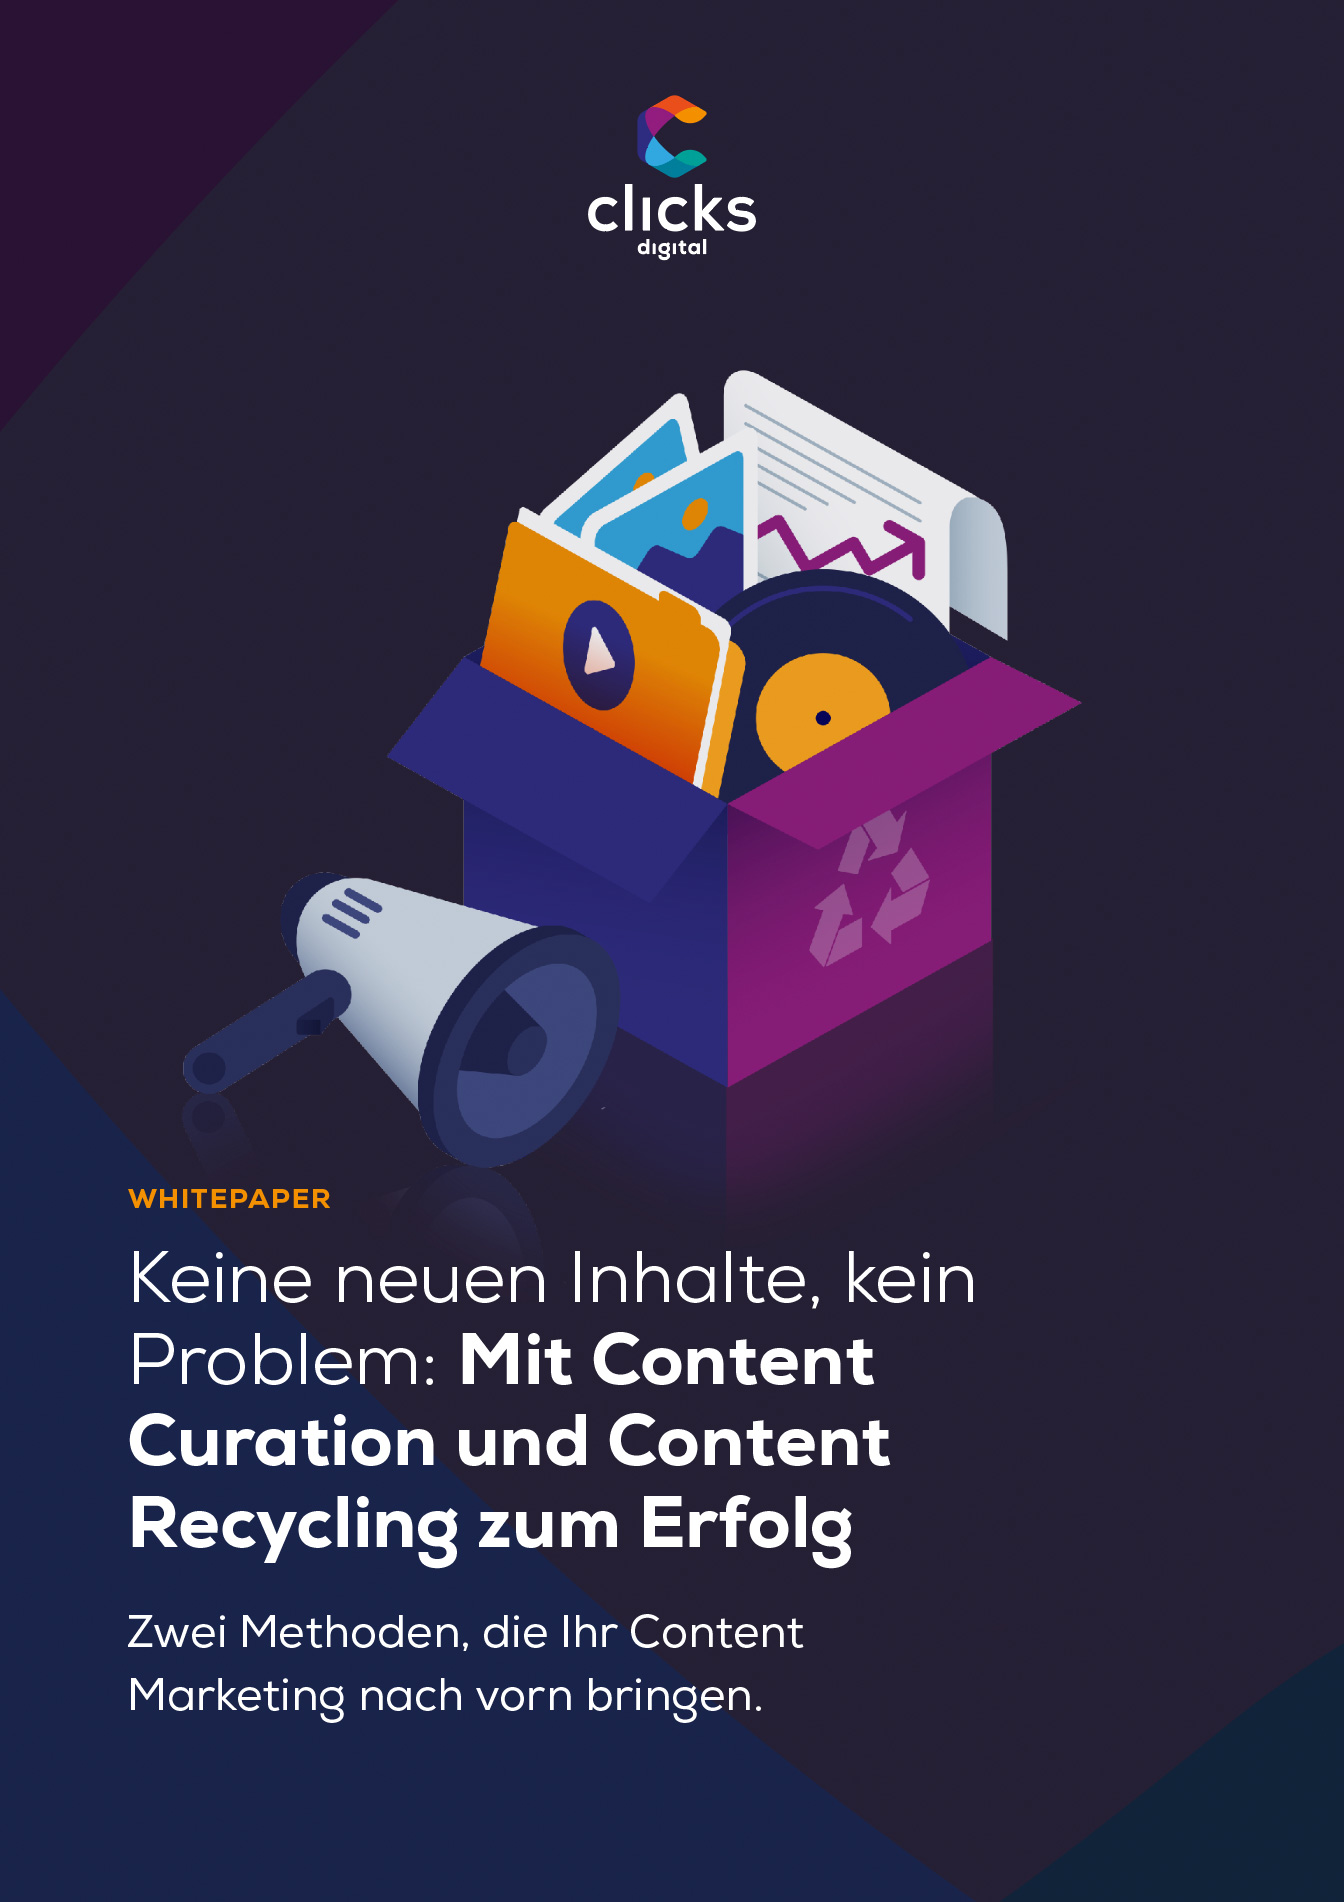 Deckblatt Content Recycling und Curation